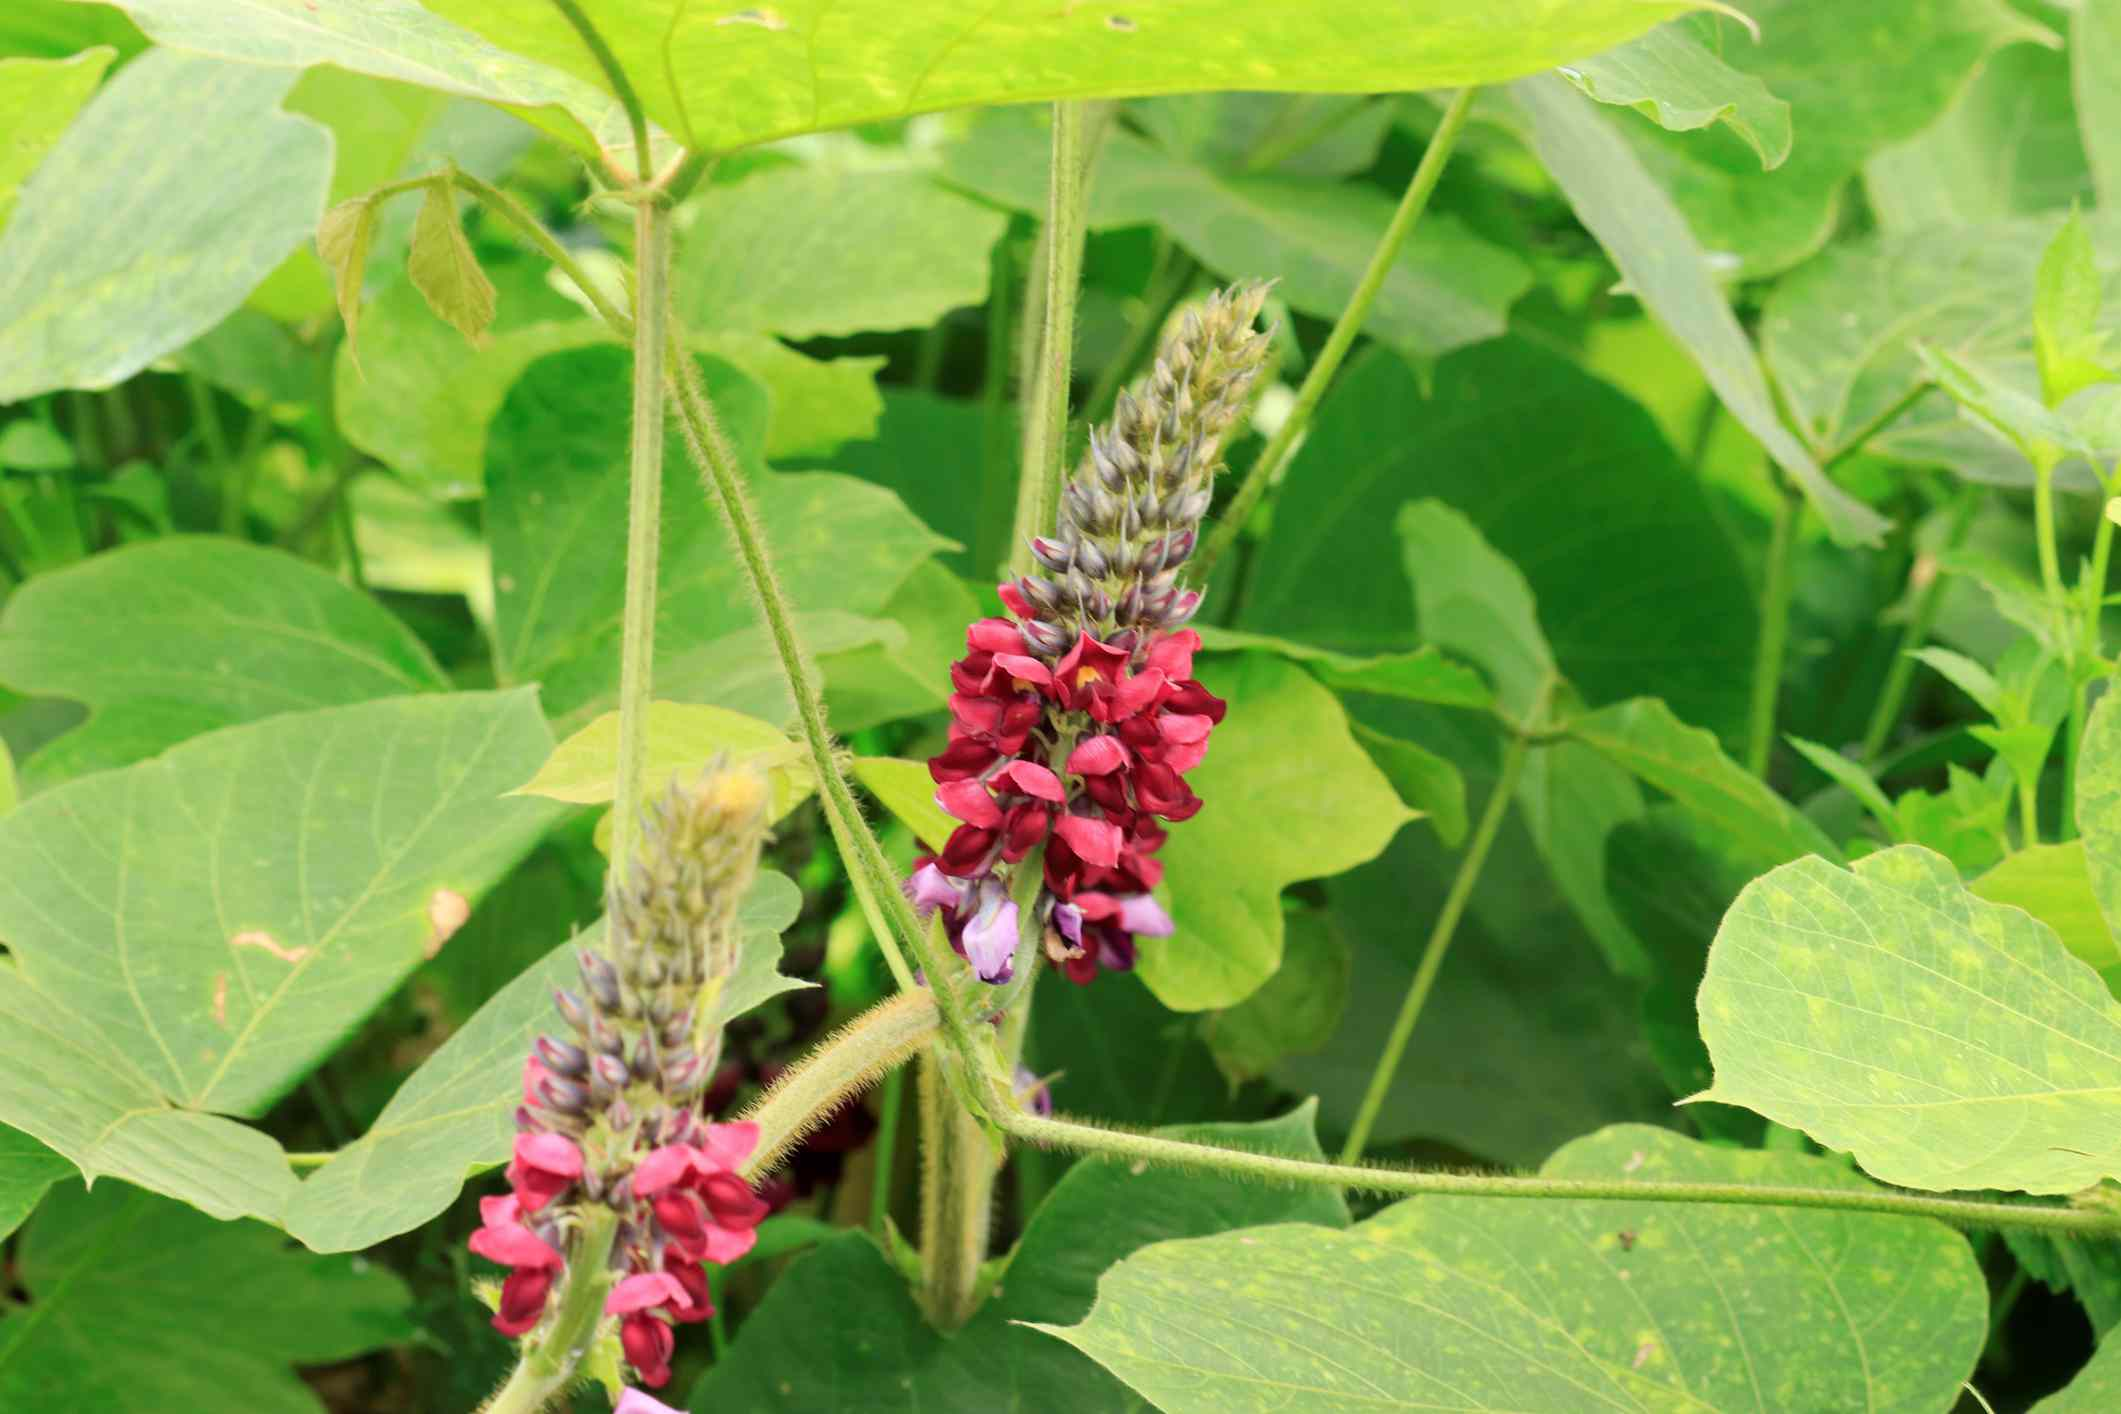 Kudzu has spike-like purple-reddish flowers in late summer